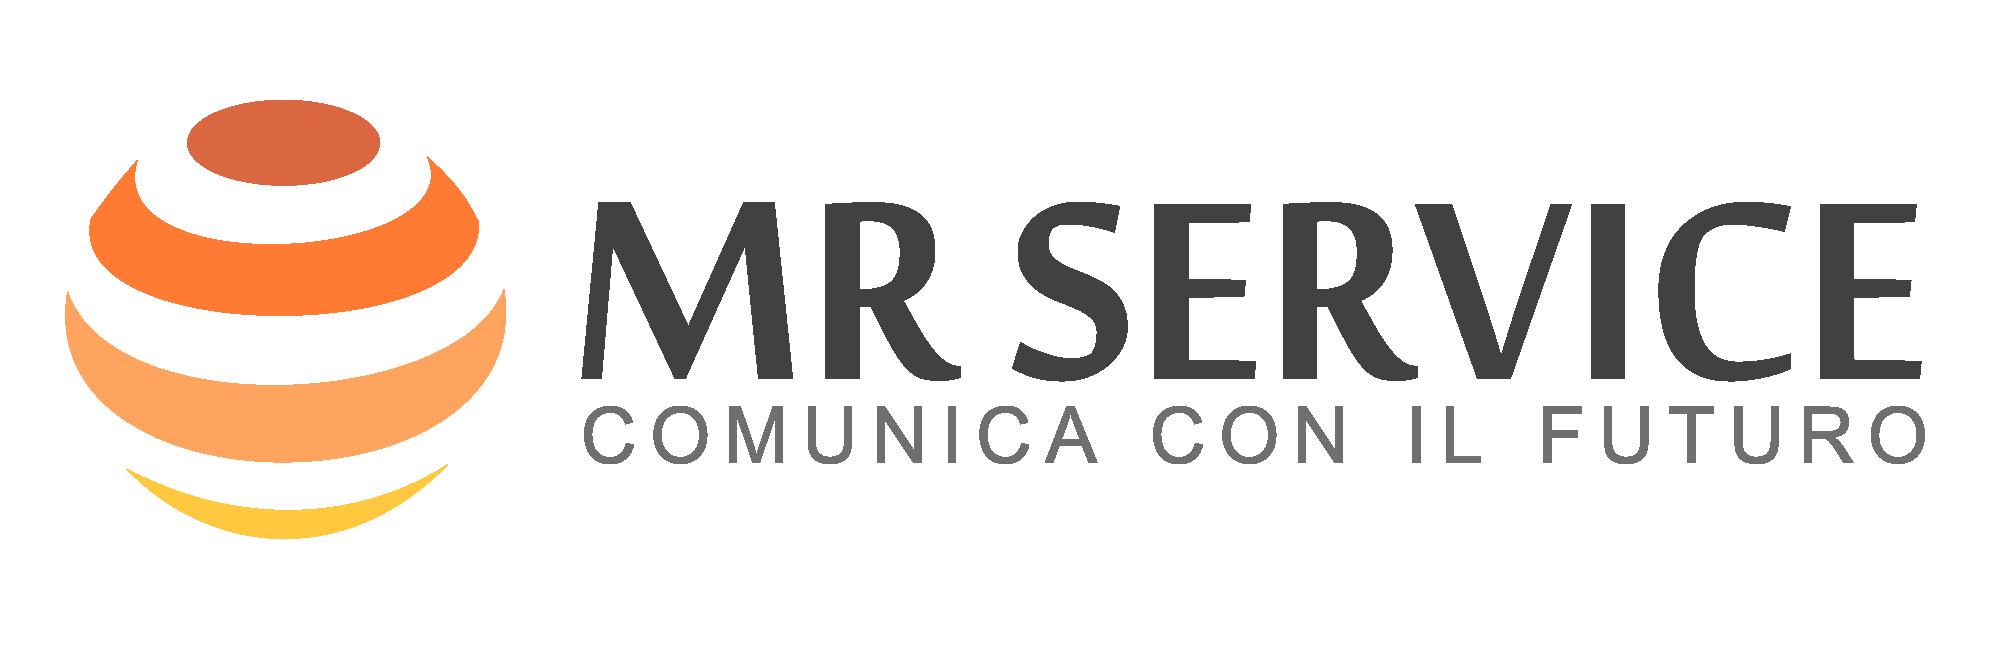 wp-content/uploads/img-loghi13/MRService_logo.png